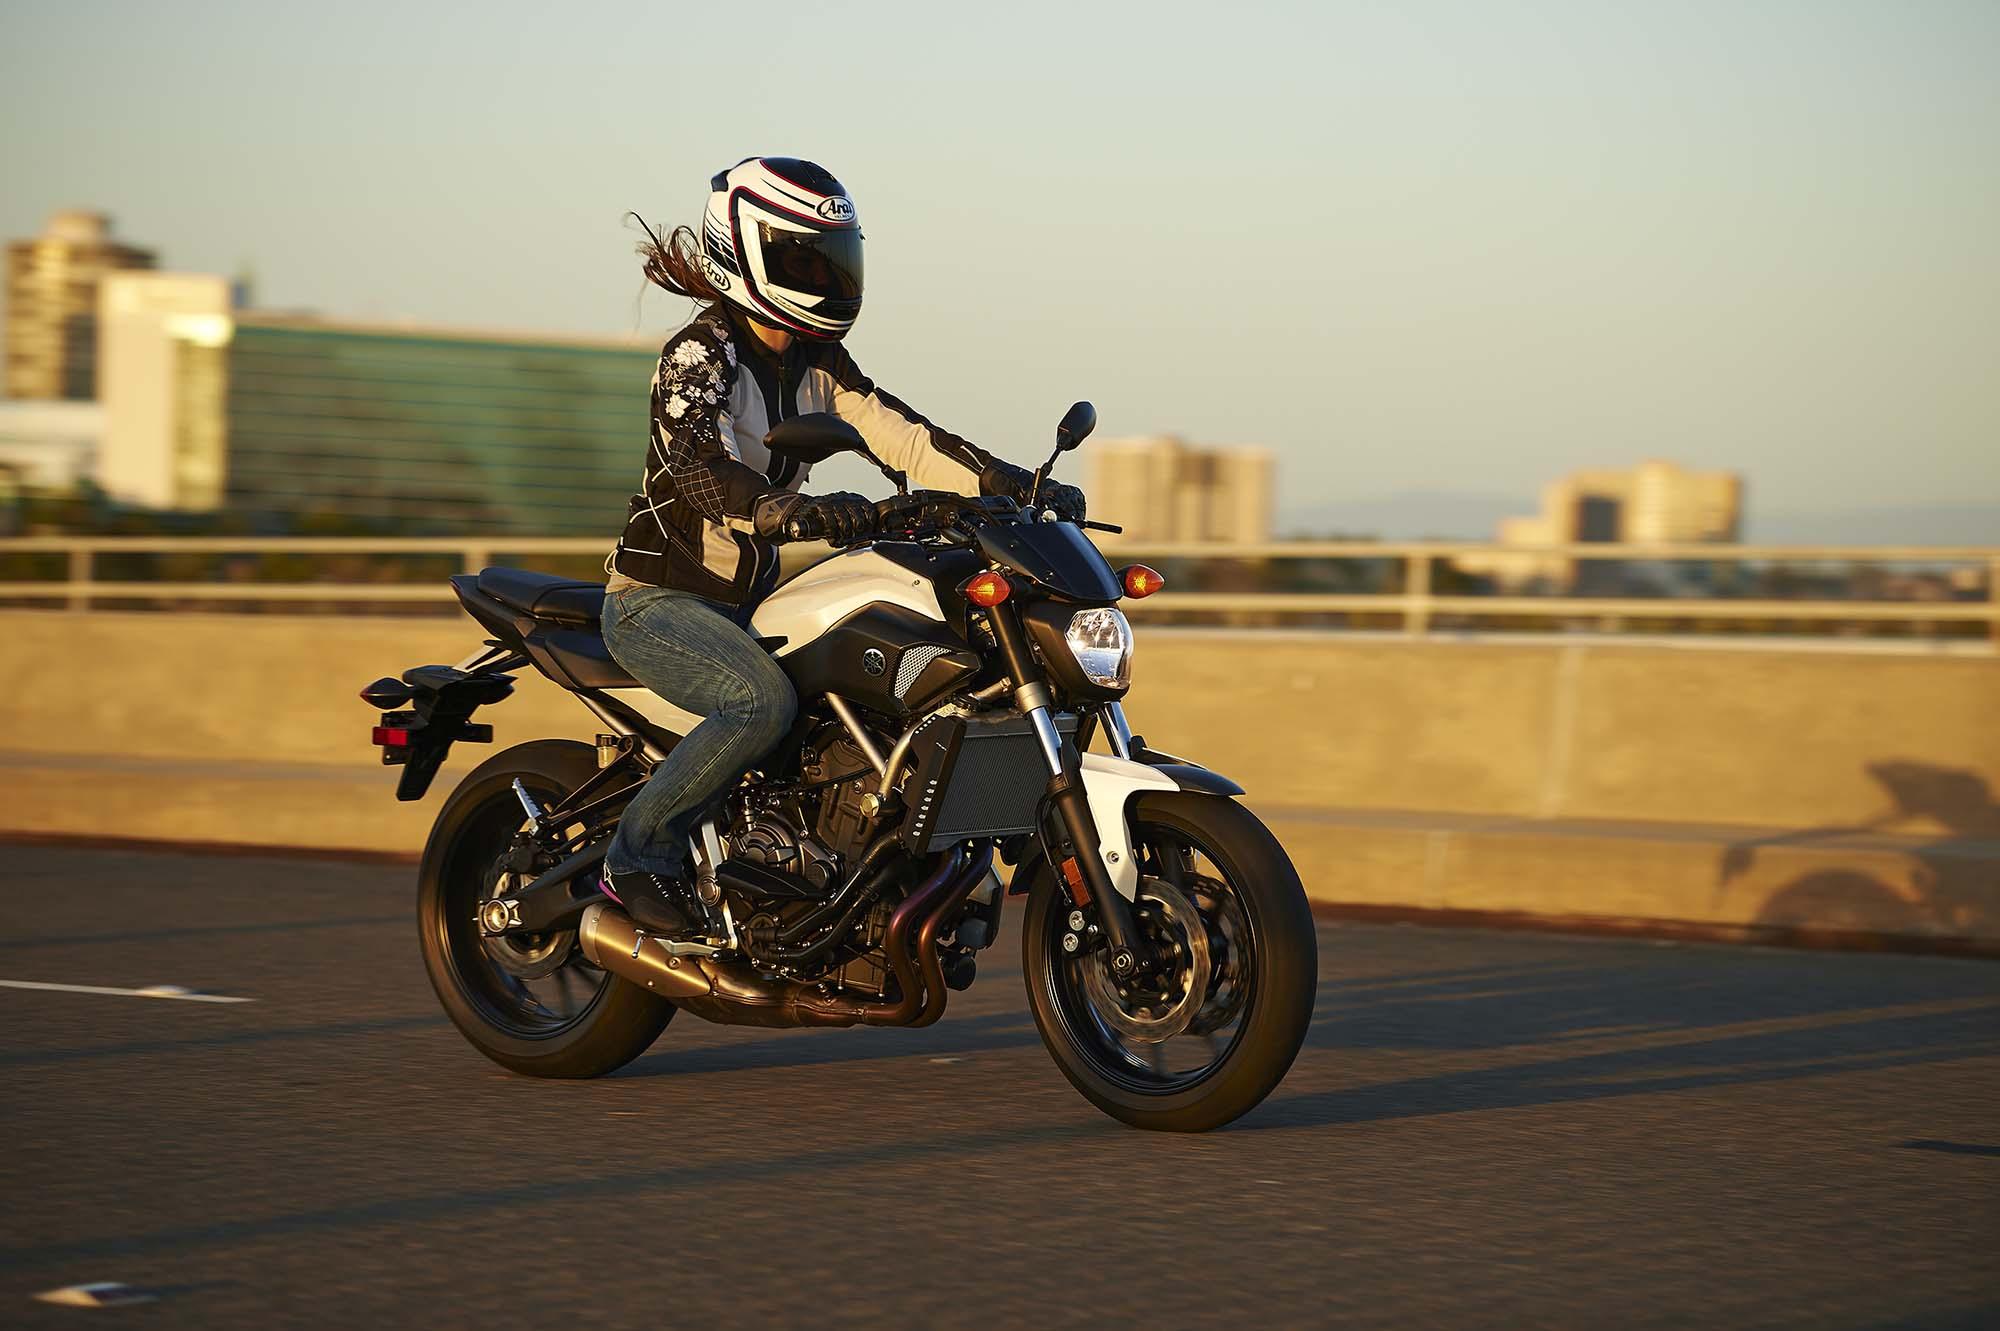 motorcycle magazine: Dont Call It the MT-07, Yamaha FZ-07